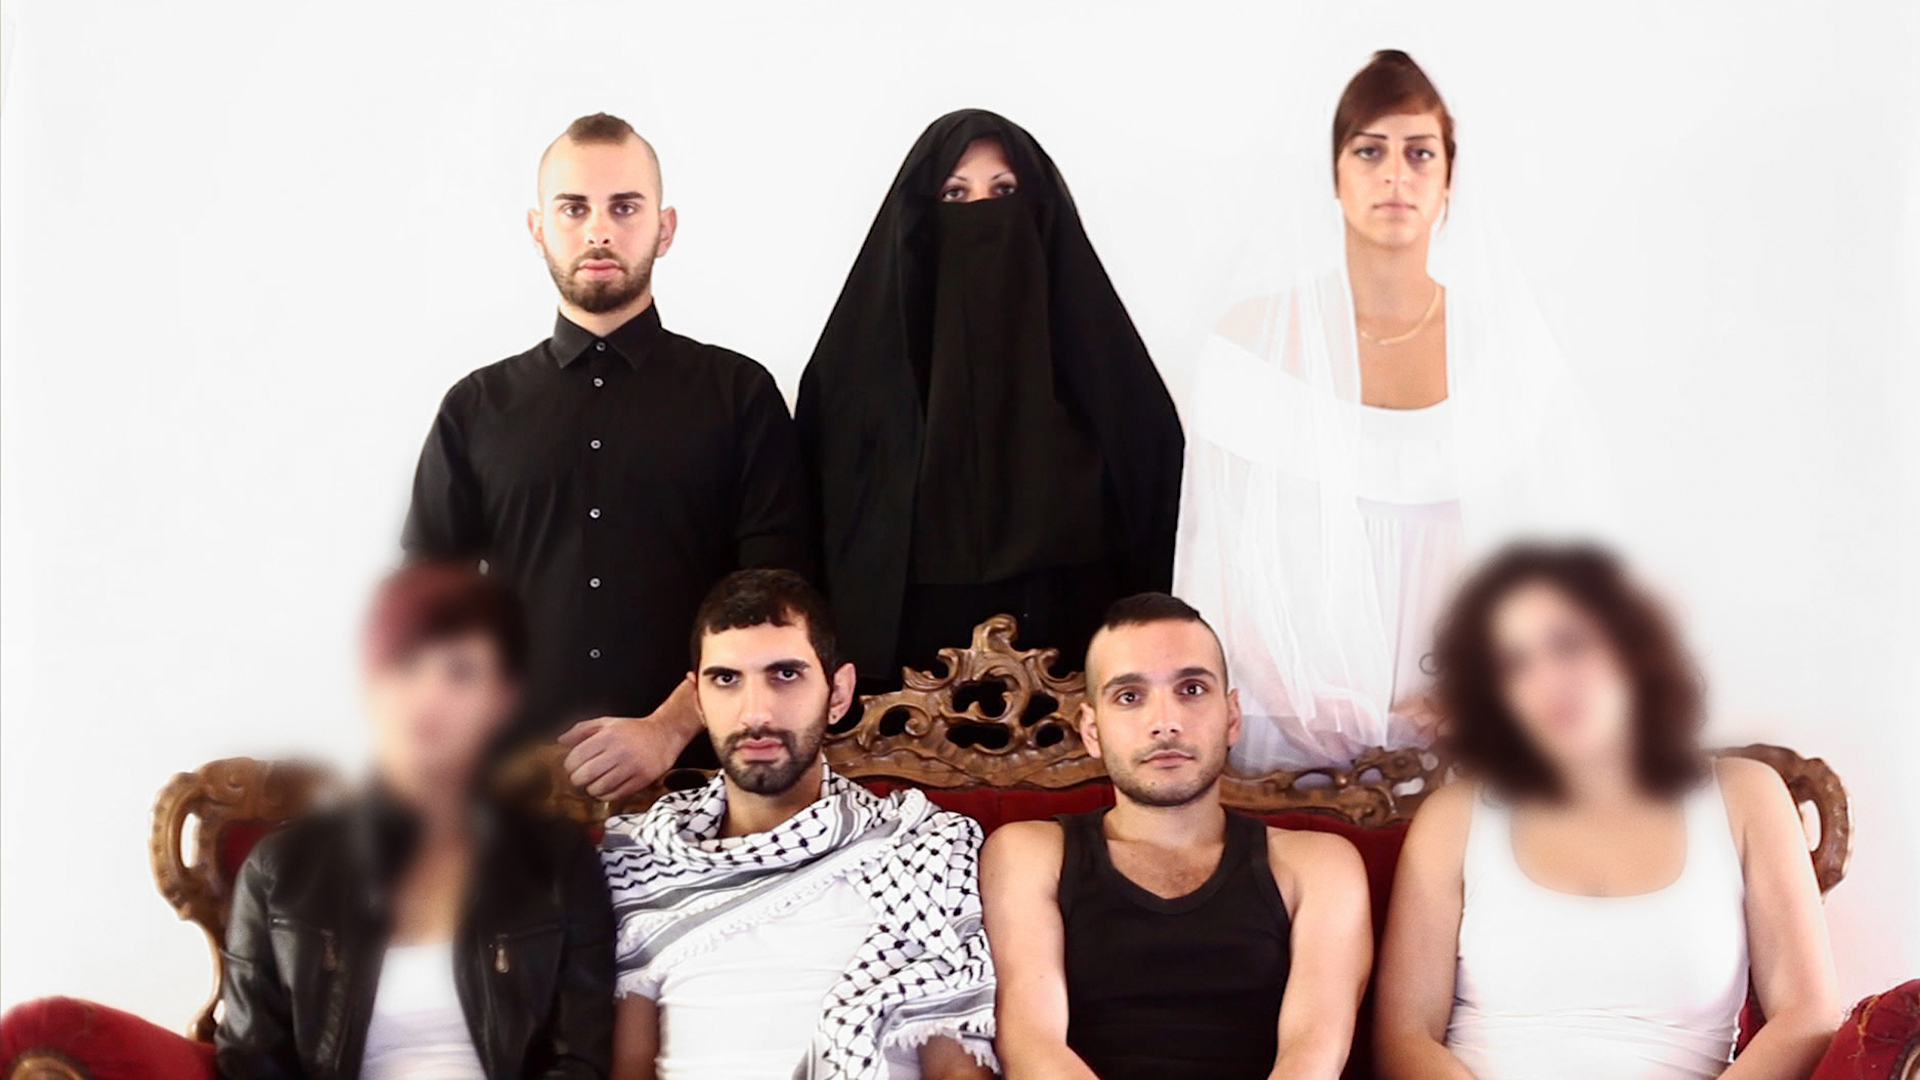 Sex photo Transsexual escorts.com